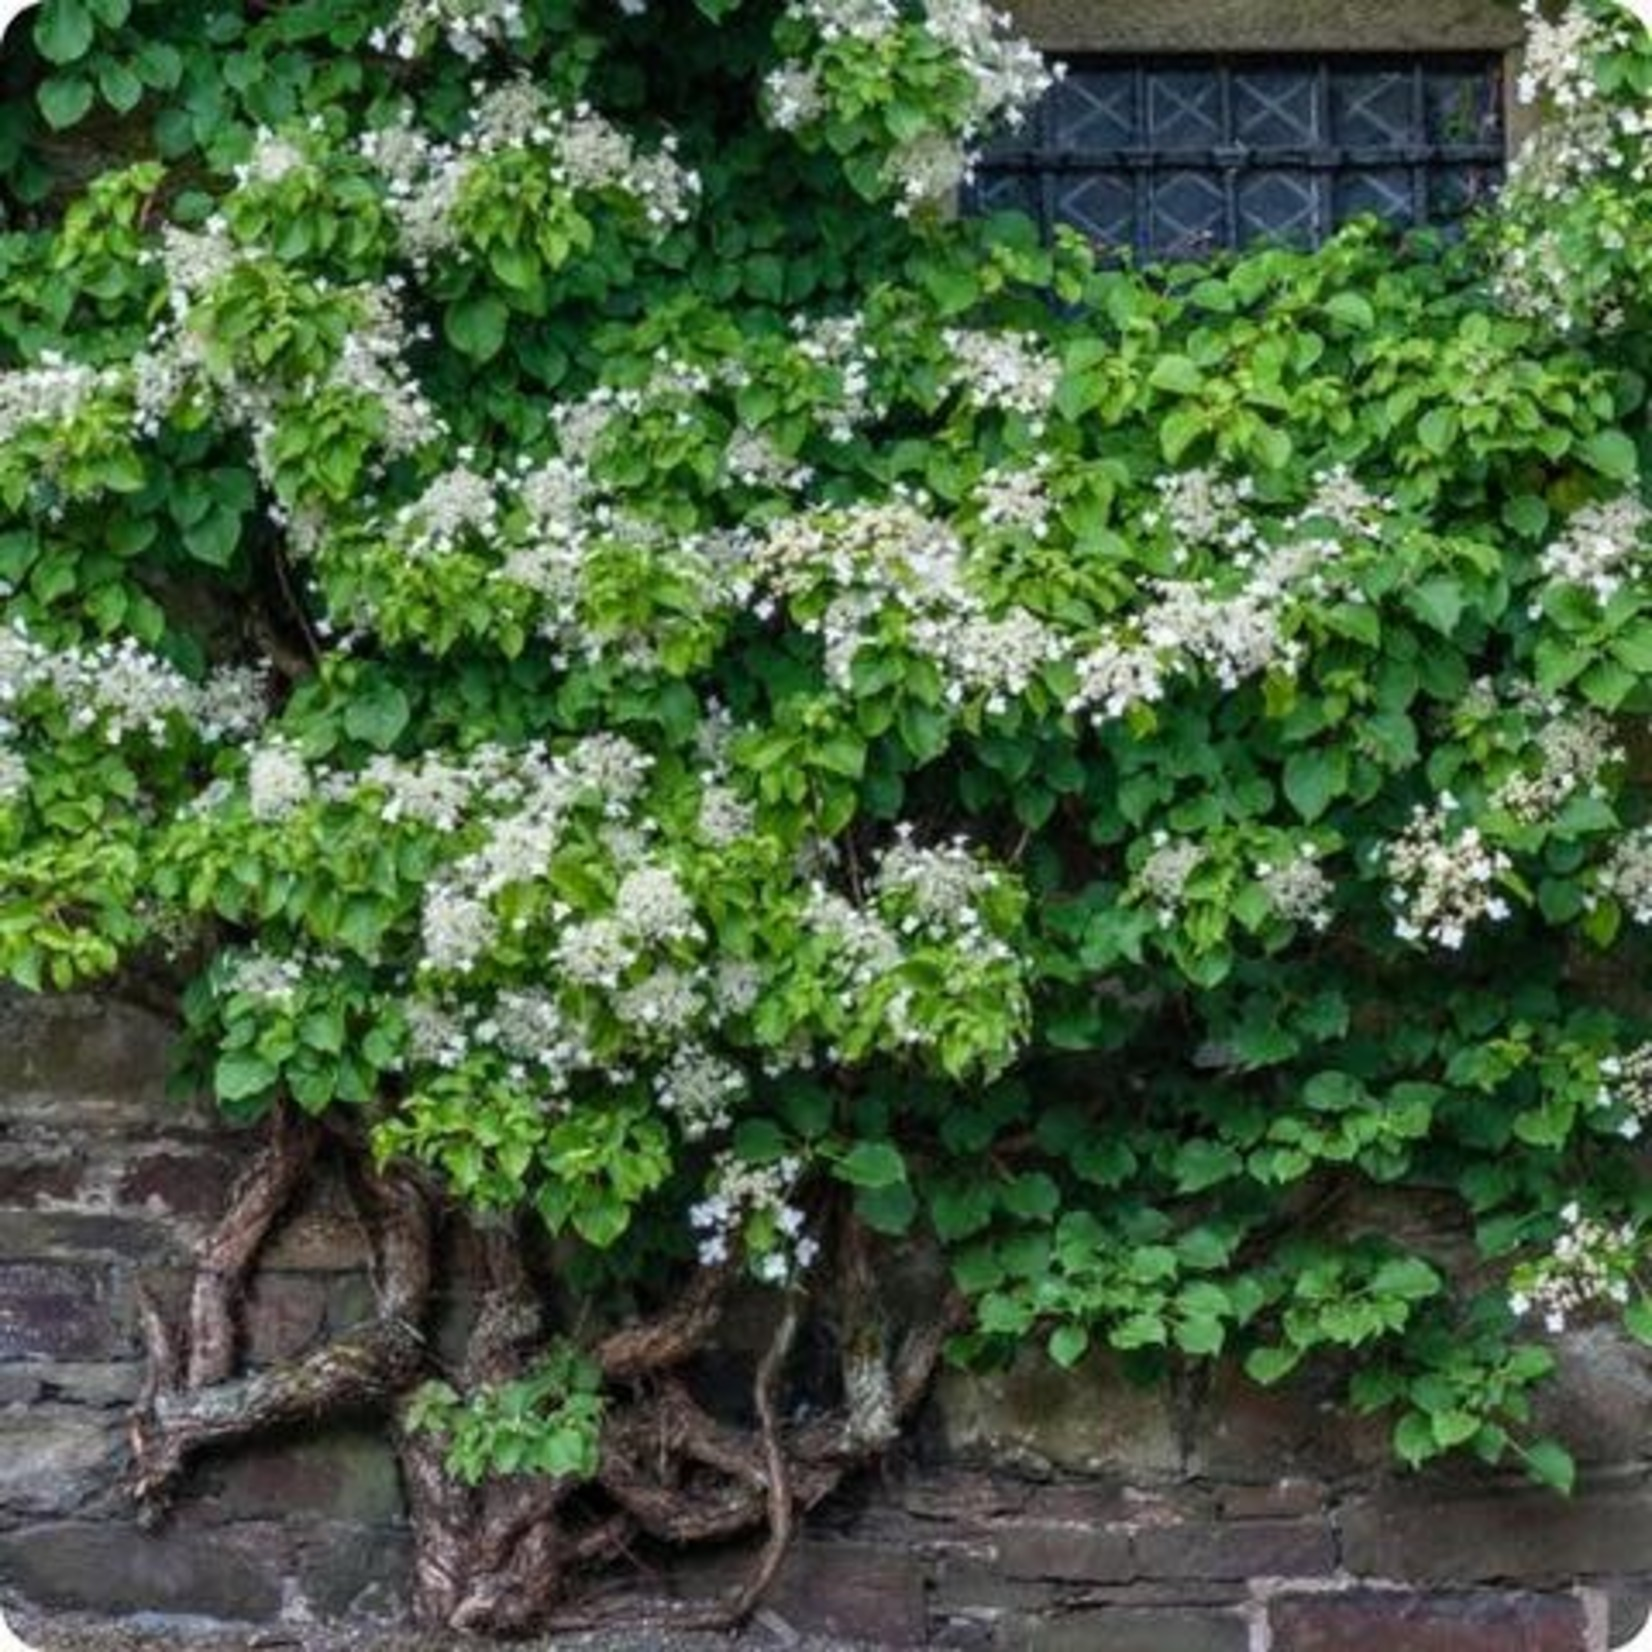 Hydrangea 'Climbing' - 2 gal staked